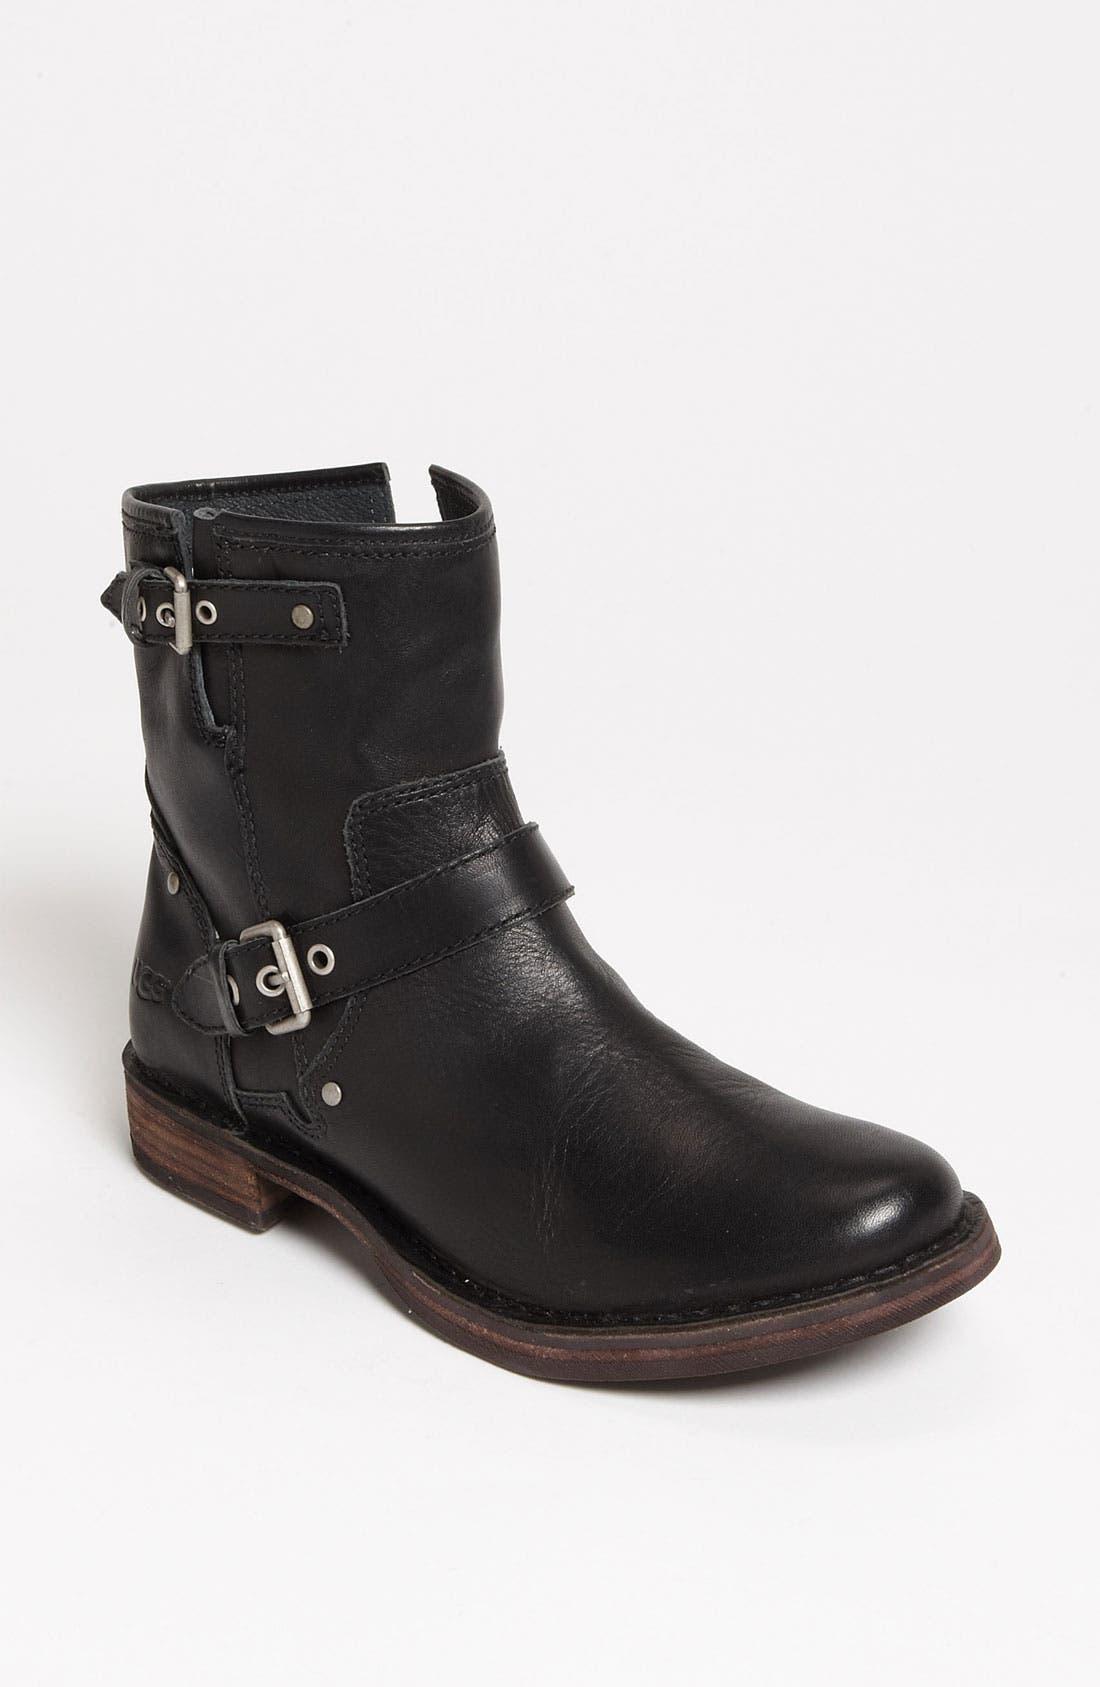 Alternate Image 1 Selected - UGG® 'Fabrizia' Boot (Women)